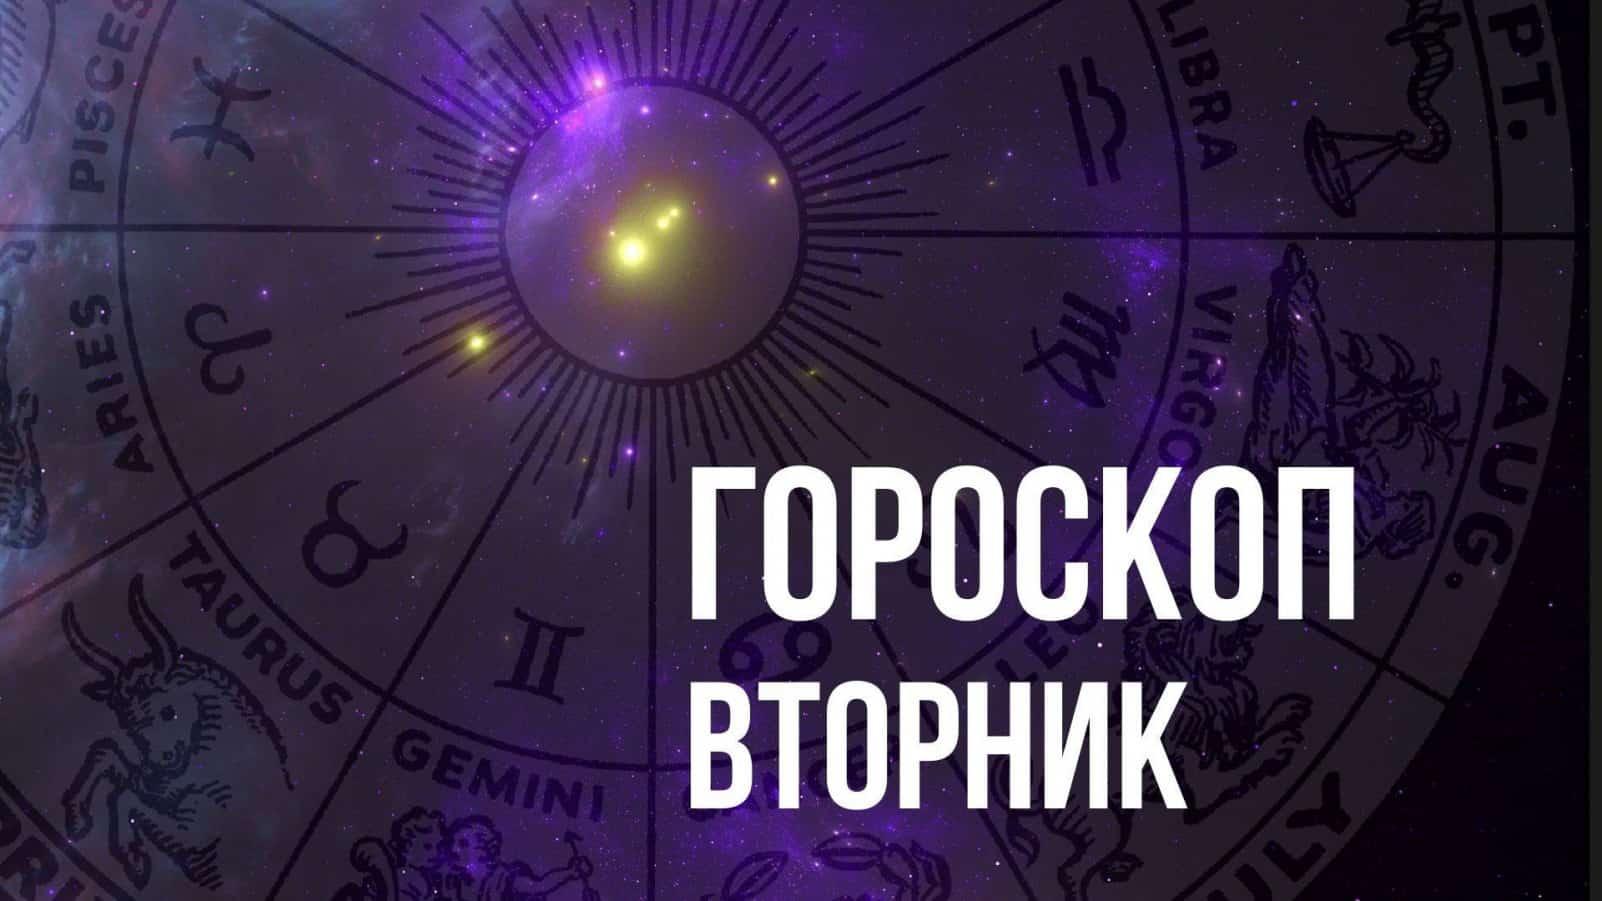 Гороскоп на вторник 24 августа для каждого знака Зодиака